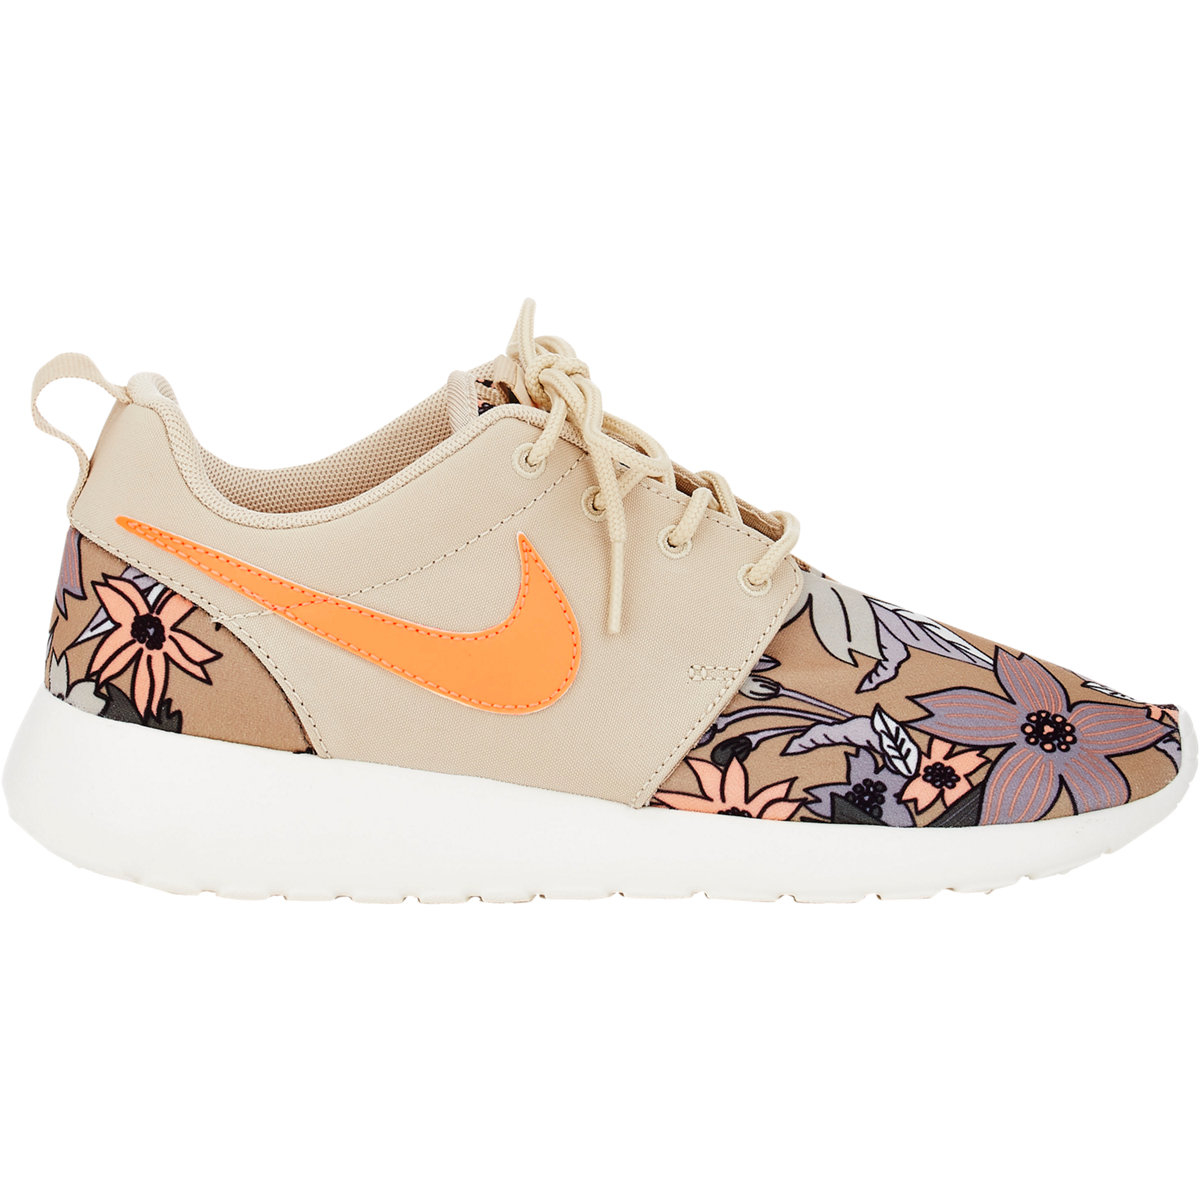 199c4a83f4cc Lyst - Nike Women s Roshe One Print Premium Sneakers in Natural